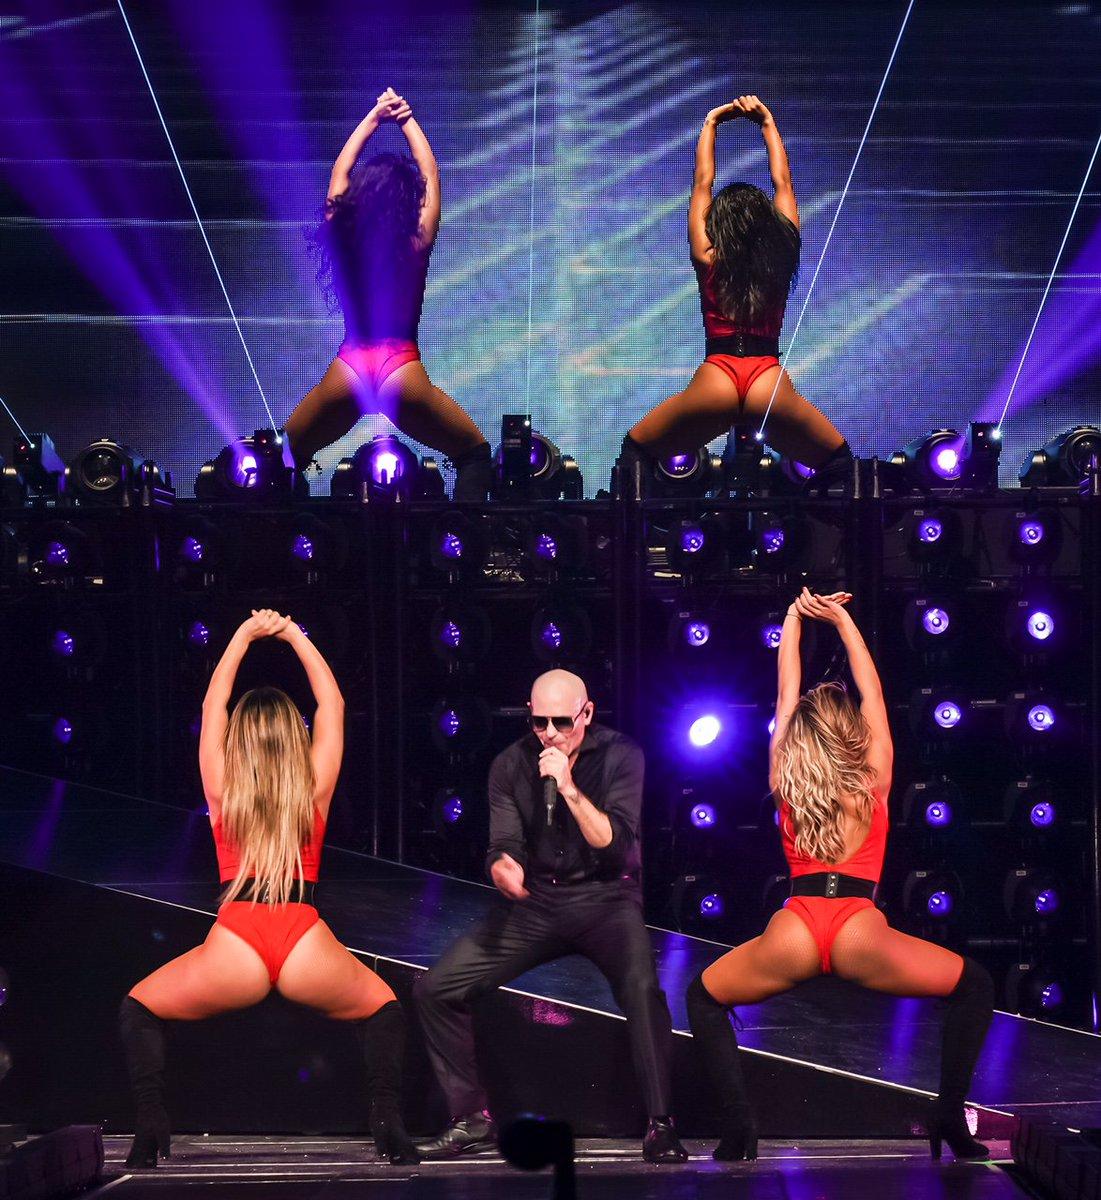 Hello Miami! Let's represent the 305 tonight #EnriquePitbullTour https...